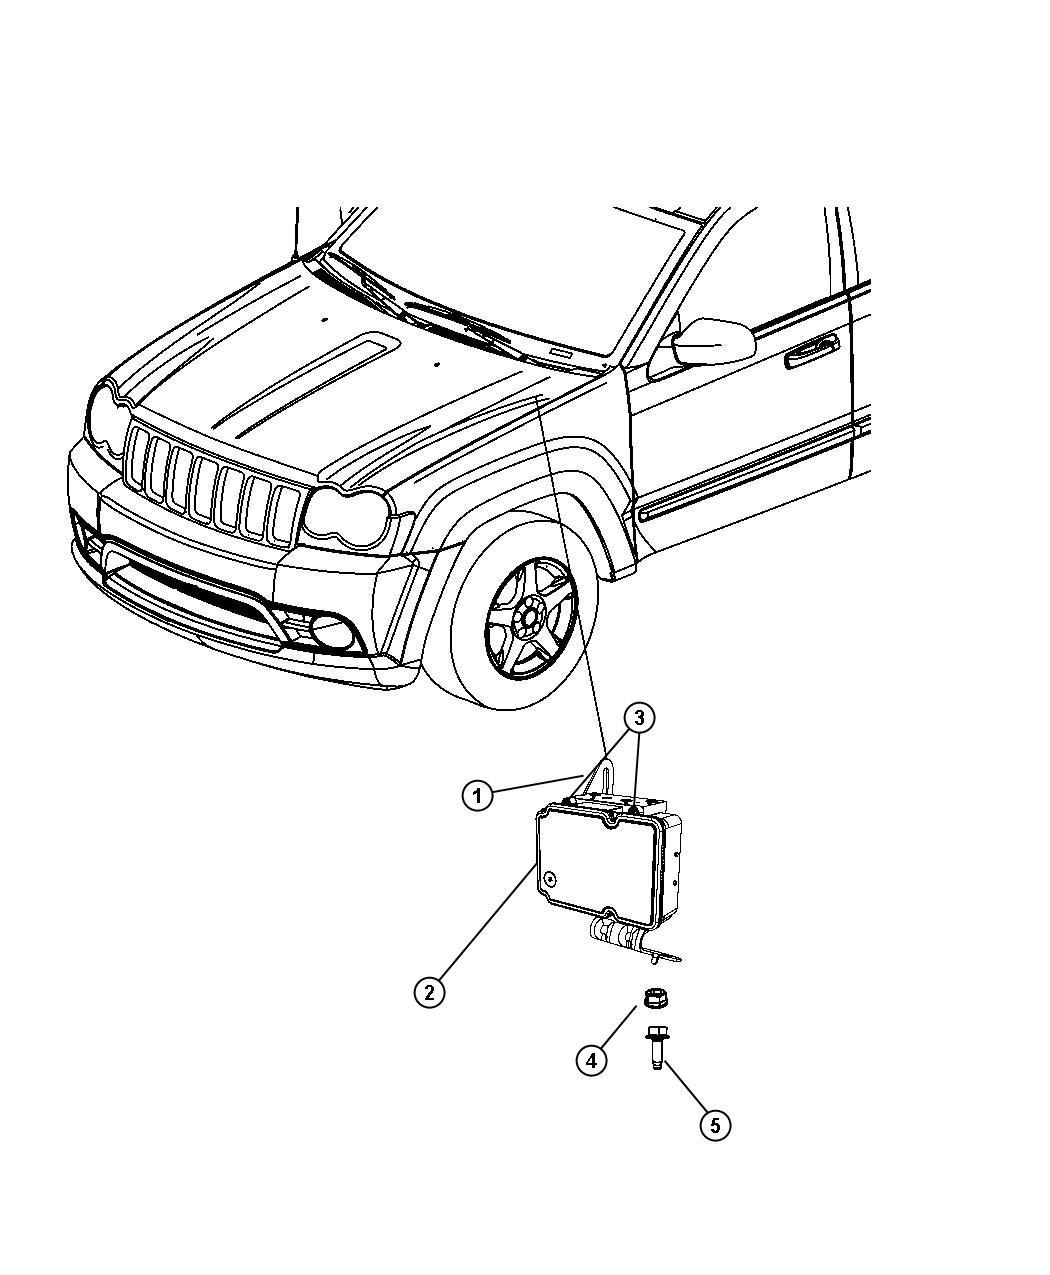 2008 Jeep Commander Control unit. Anti-lock brake. Modules